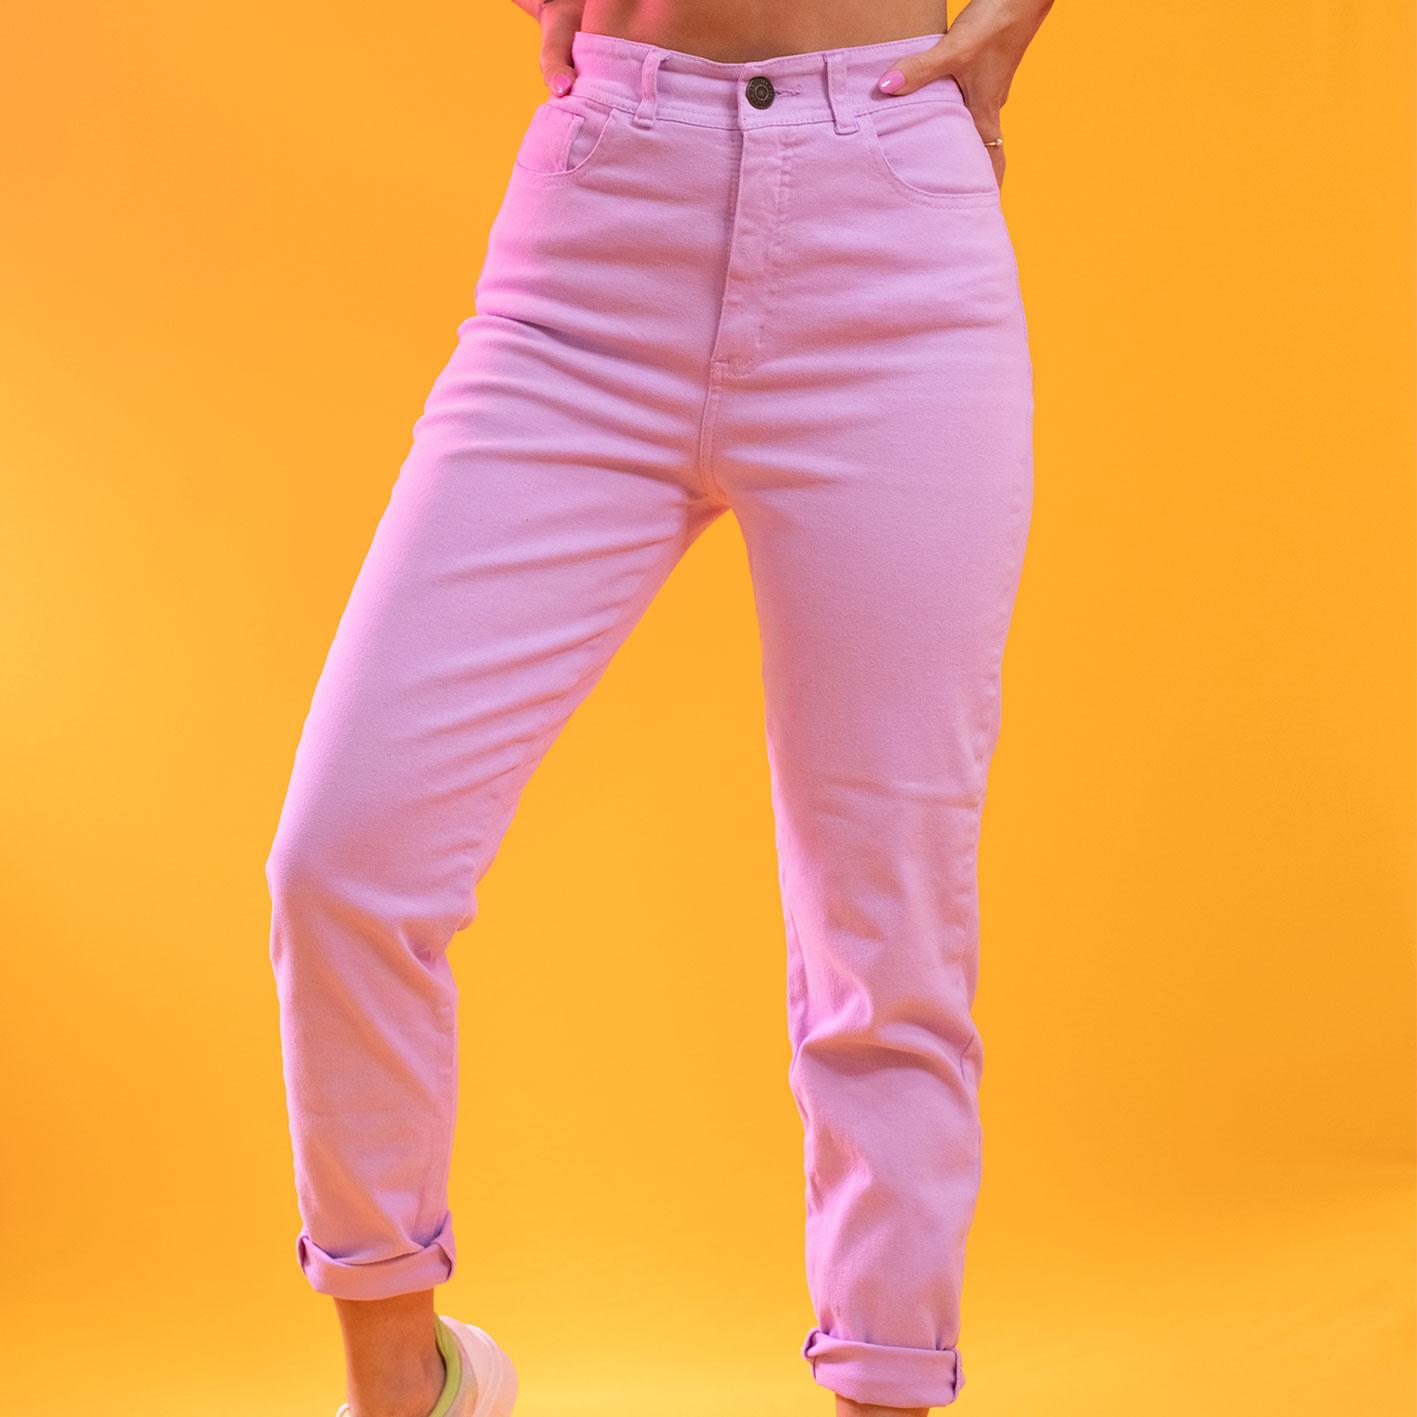 Mom Jeans Coleccion Capsula-Kuña Vale by Puppa Cod. 1200402